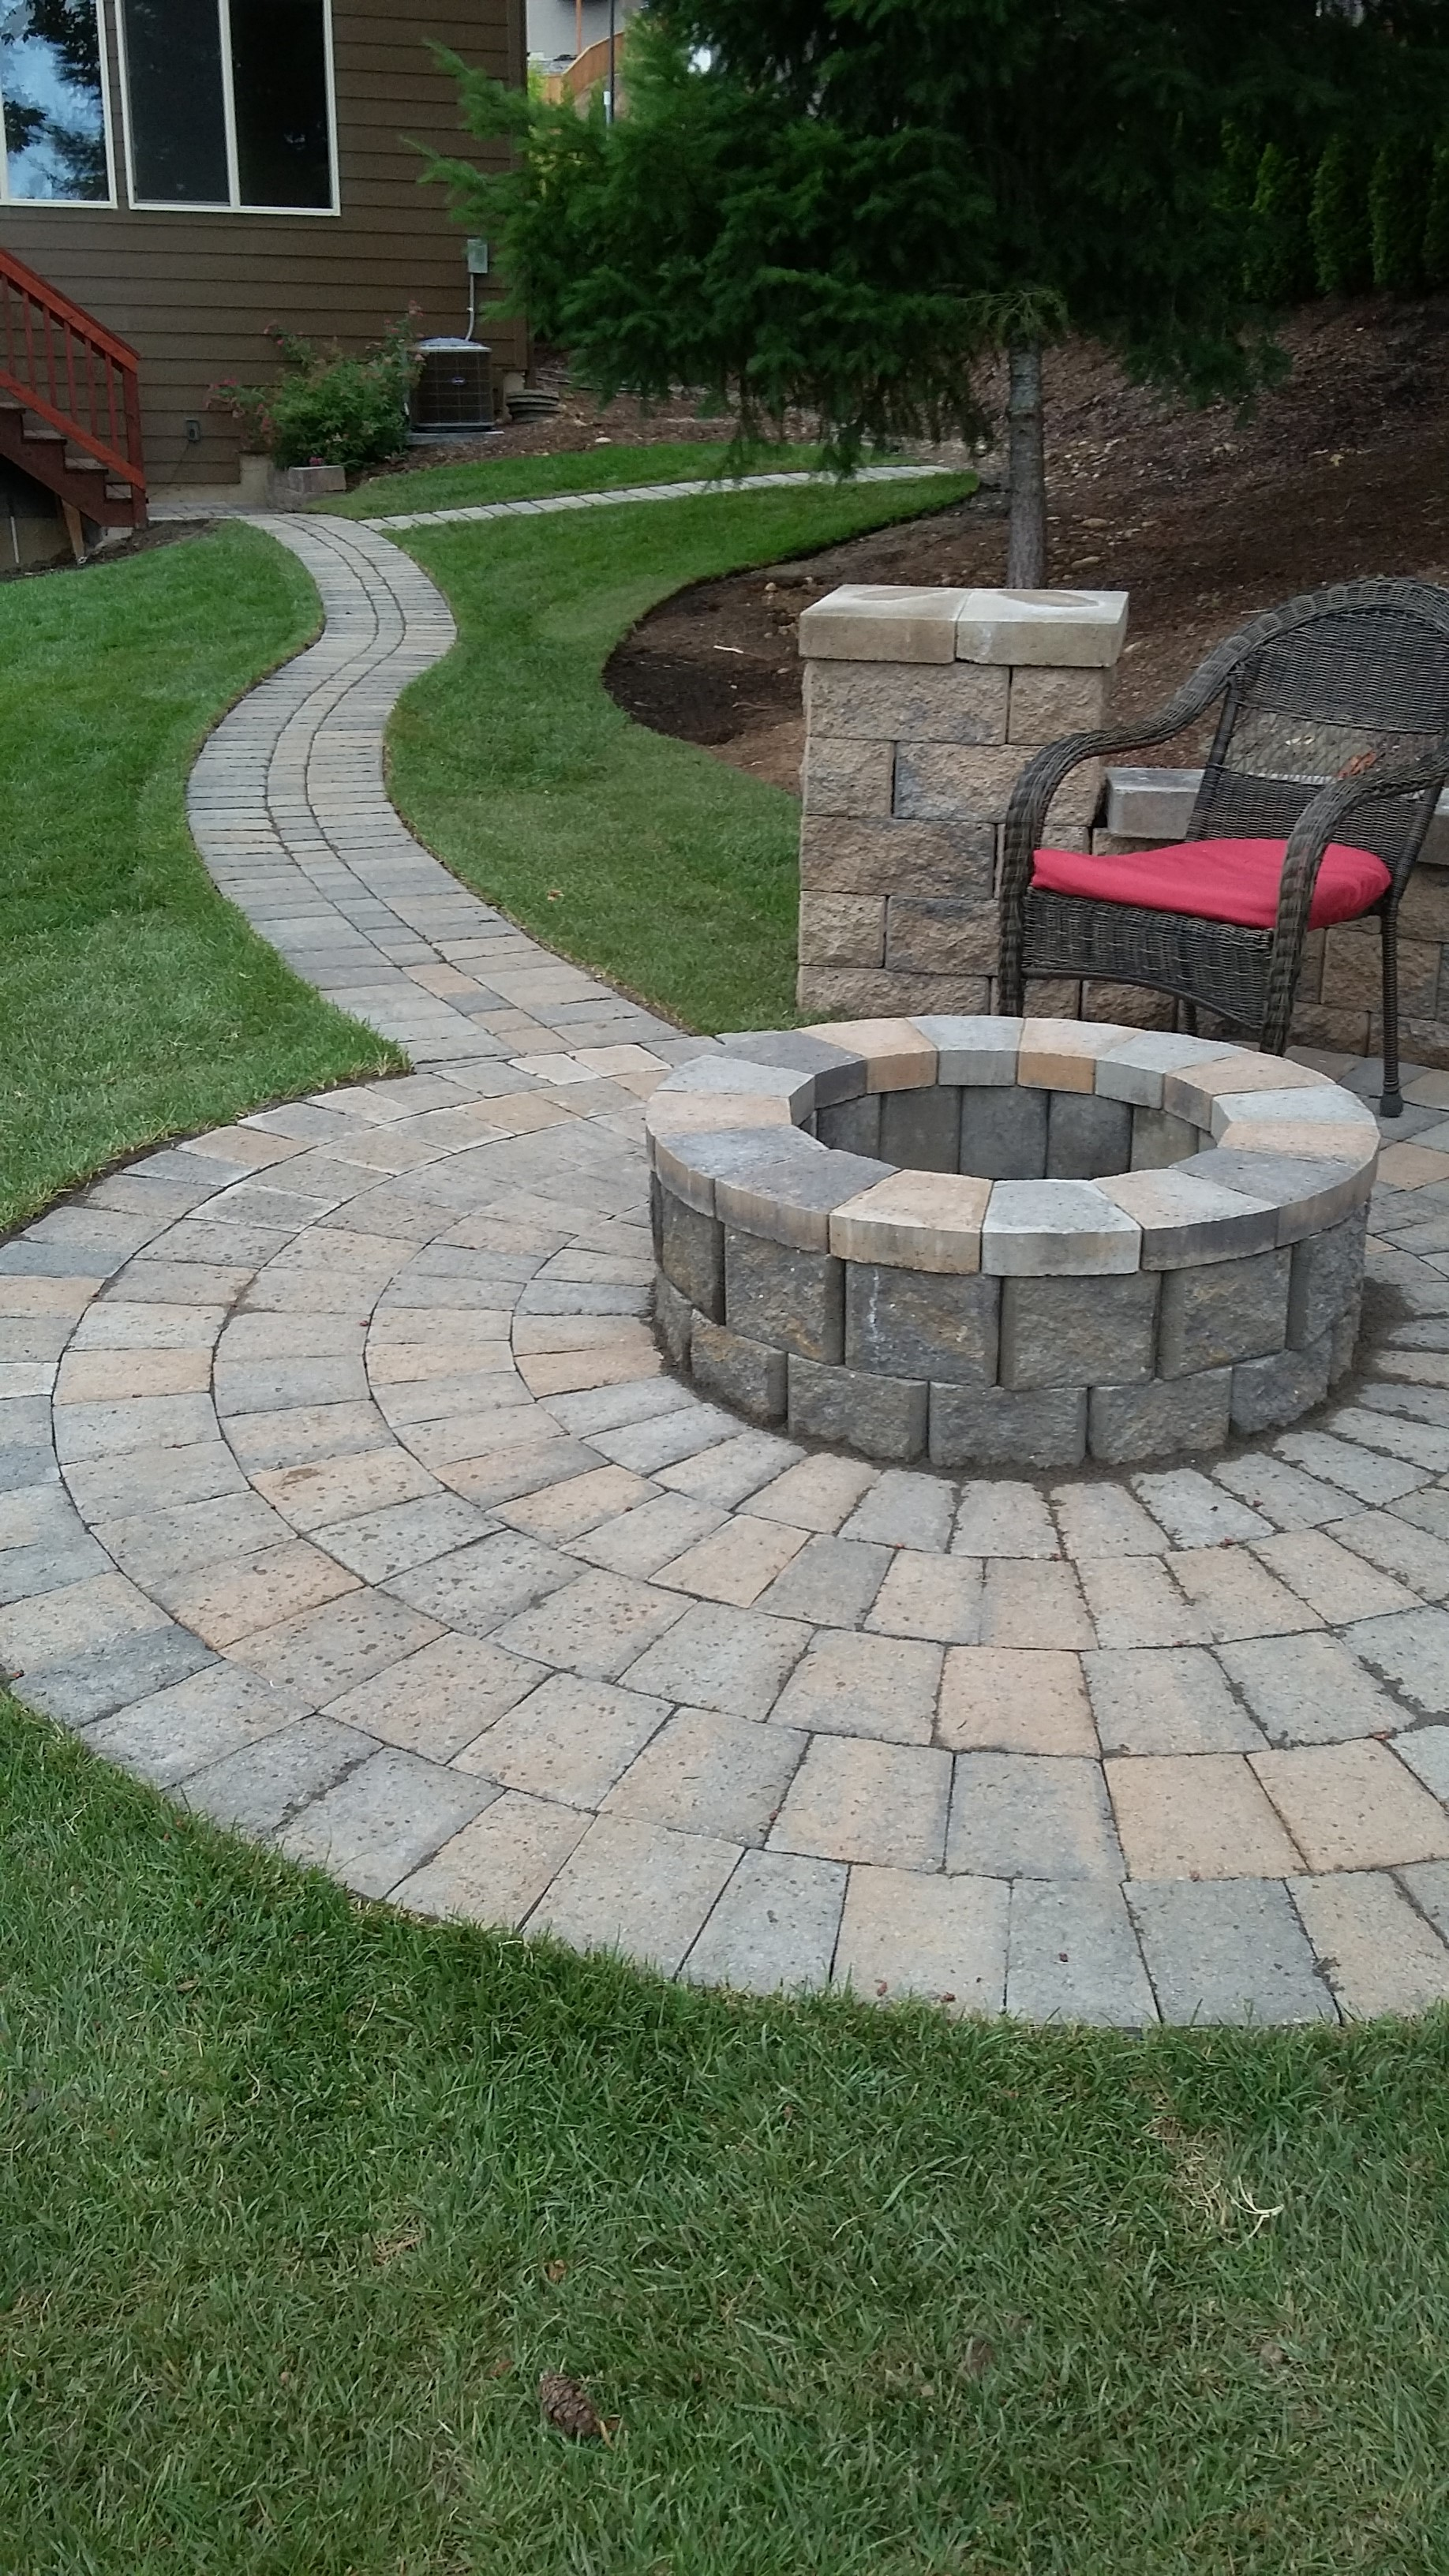 Portland Cement Decor : Garden tables and benches concrete decorative bench